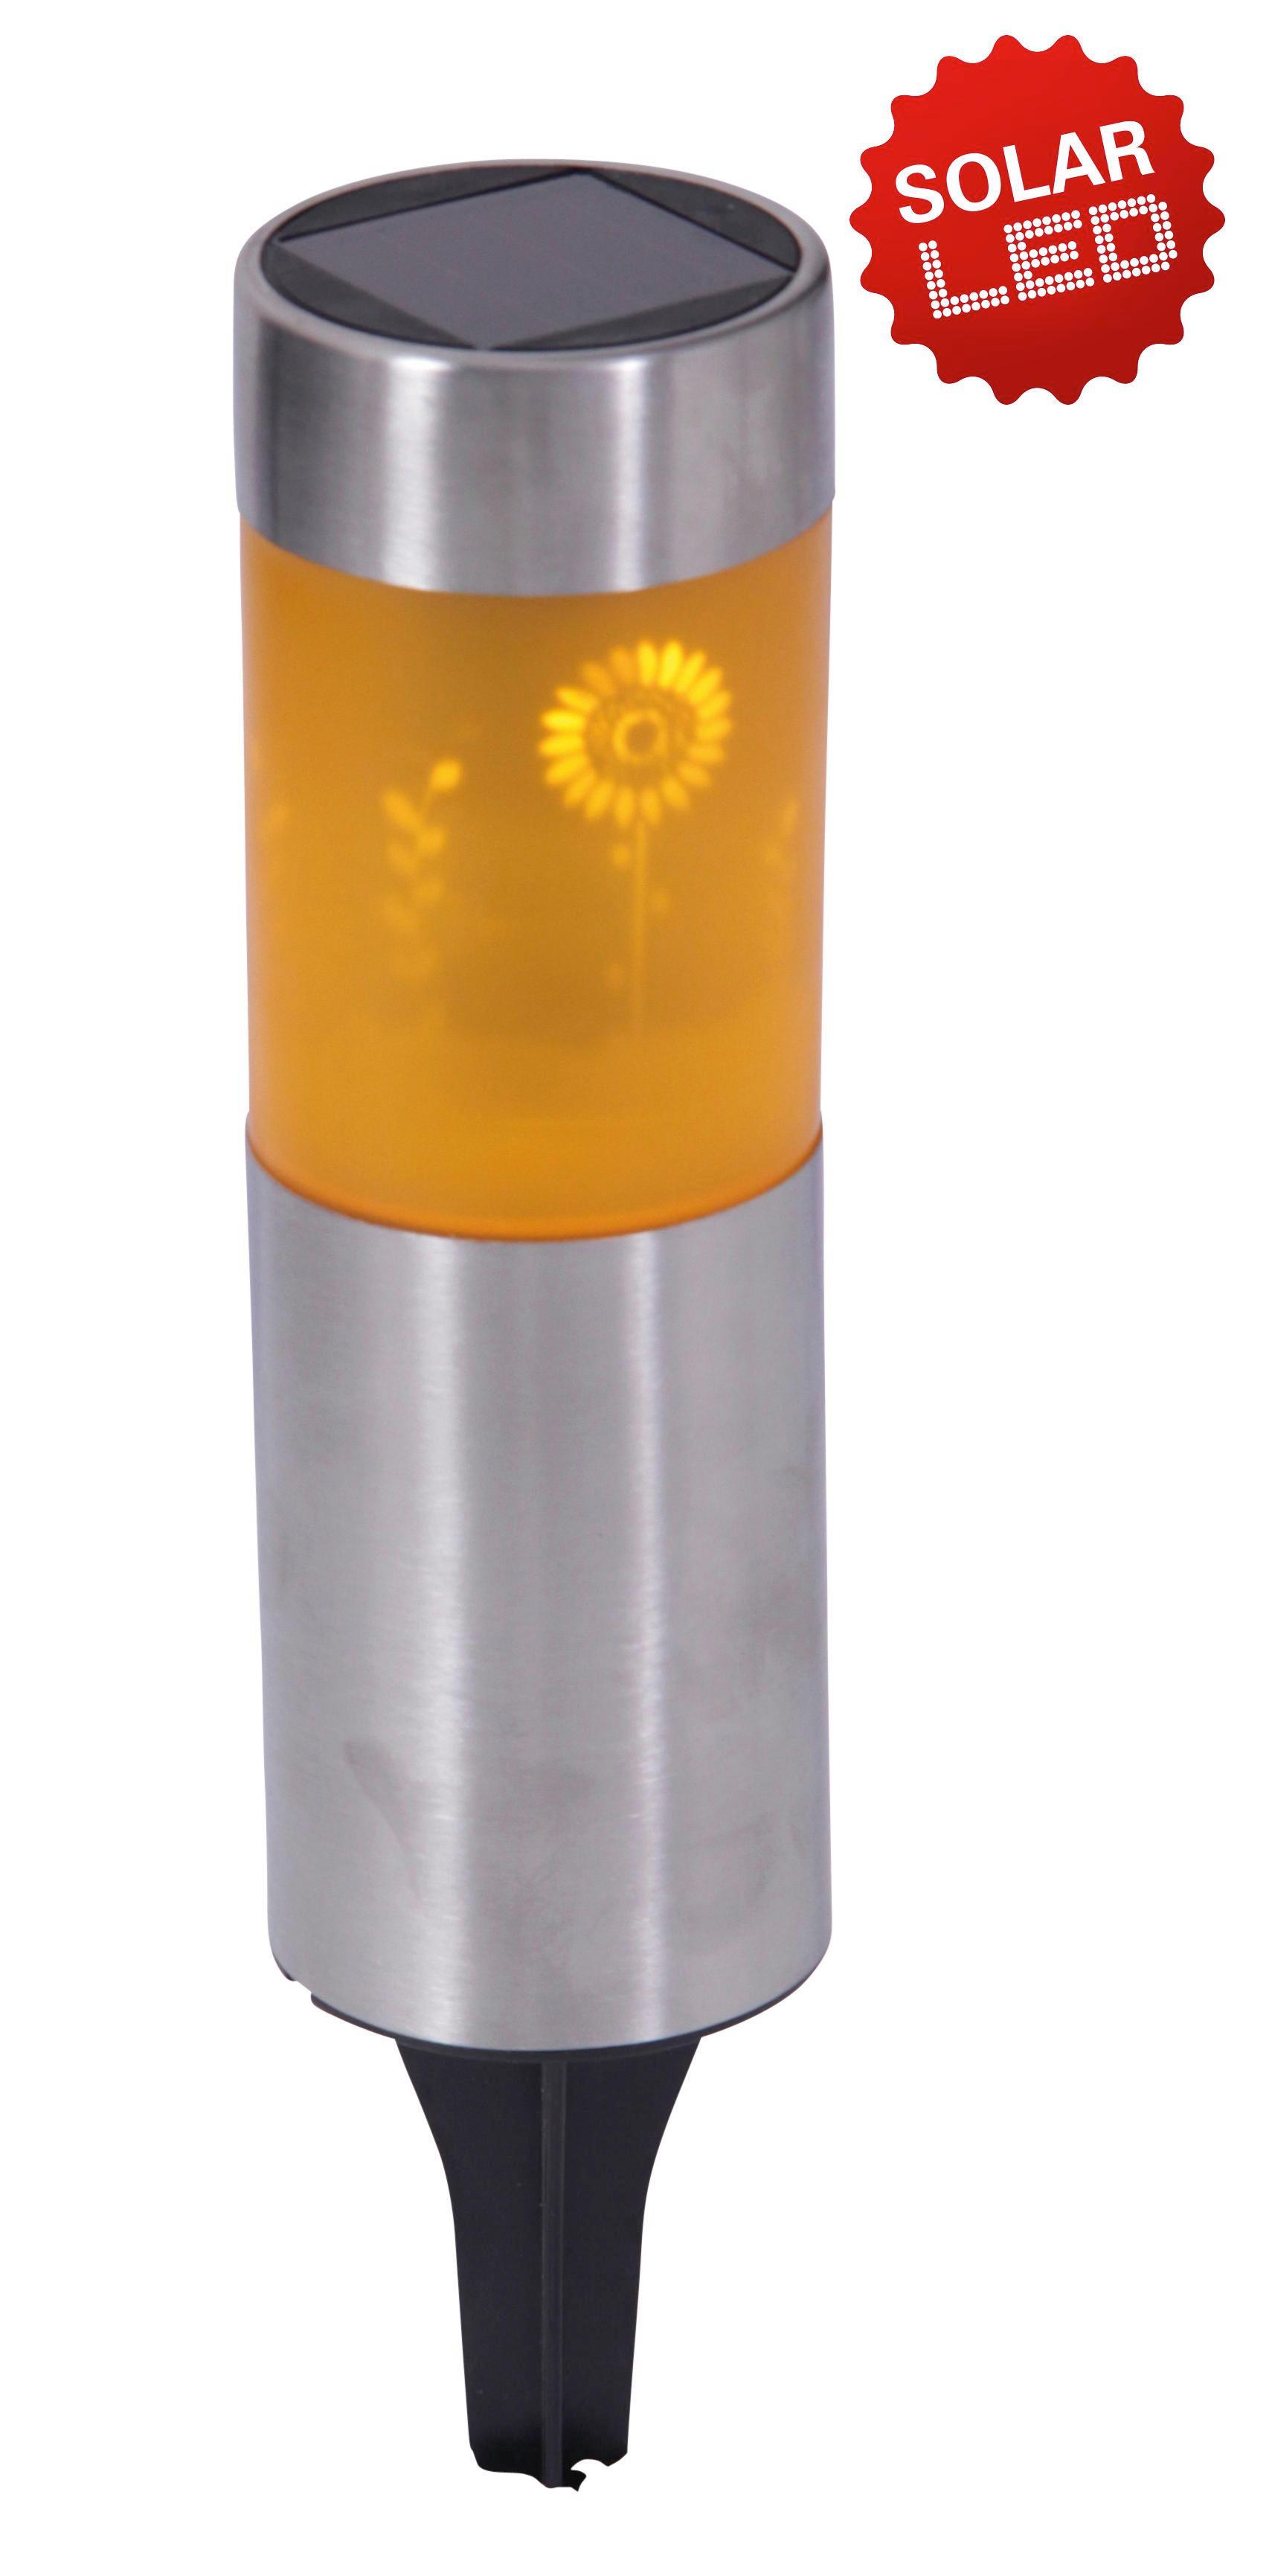 SOLARLEUCHTE - Edelstahlfarben/Gelb, Design, Kunststoff/Metall (6,4/31,2cm)